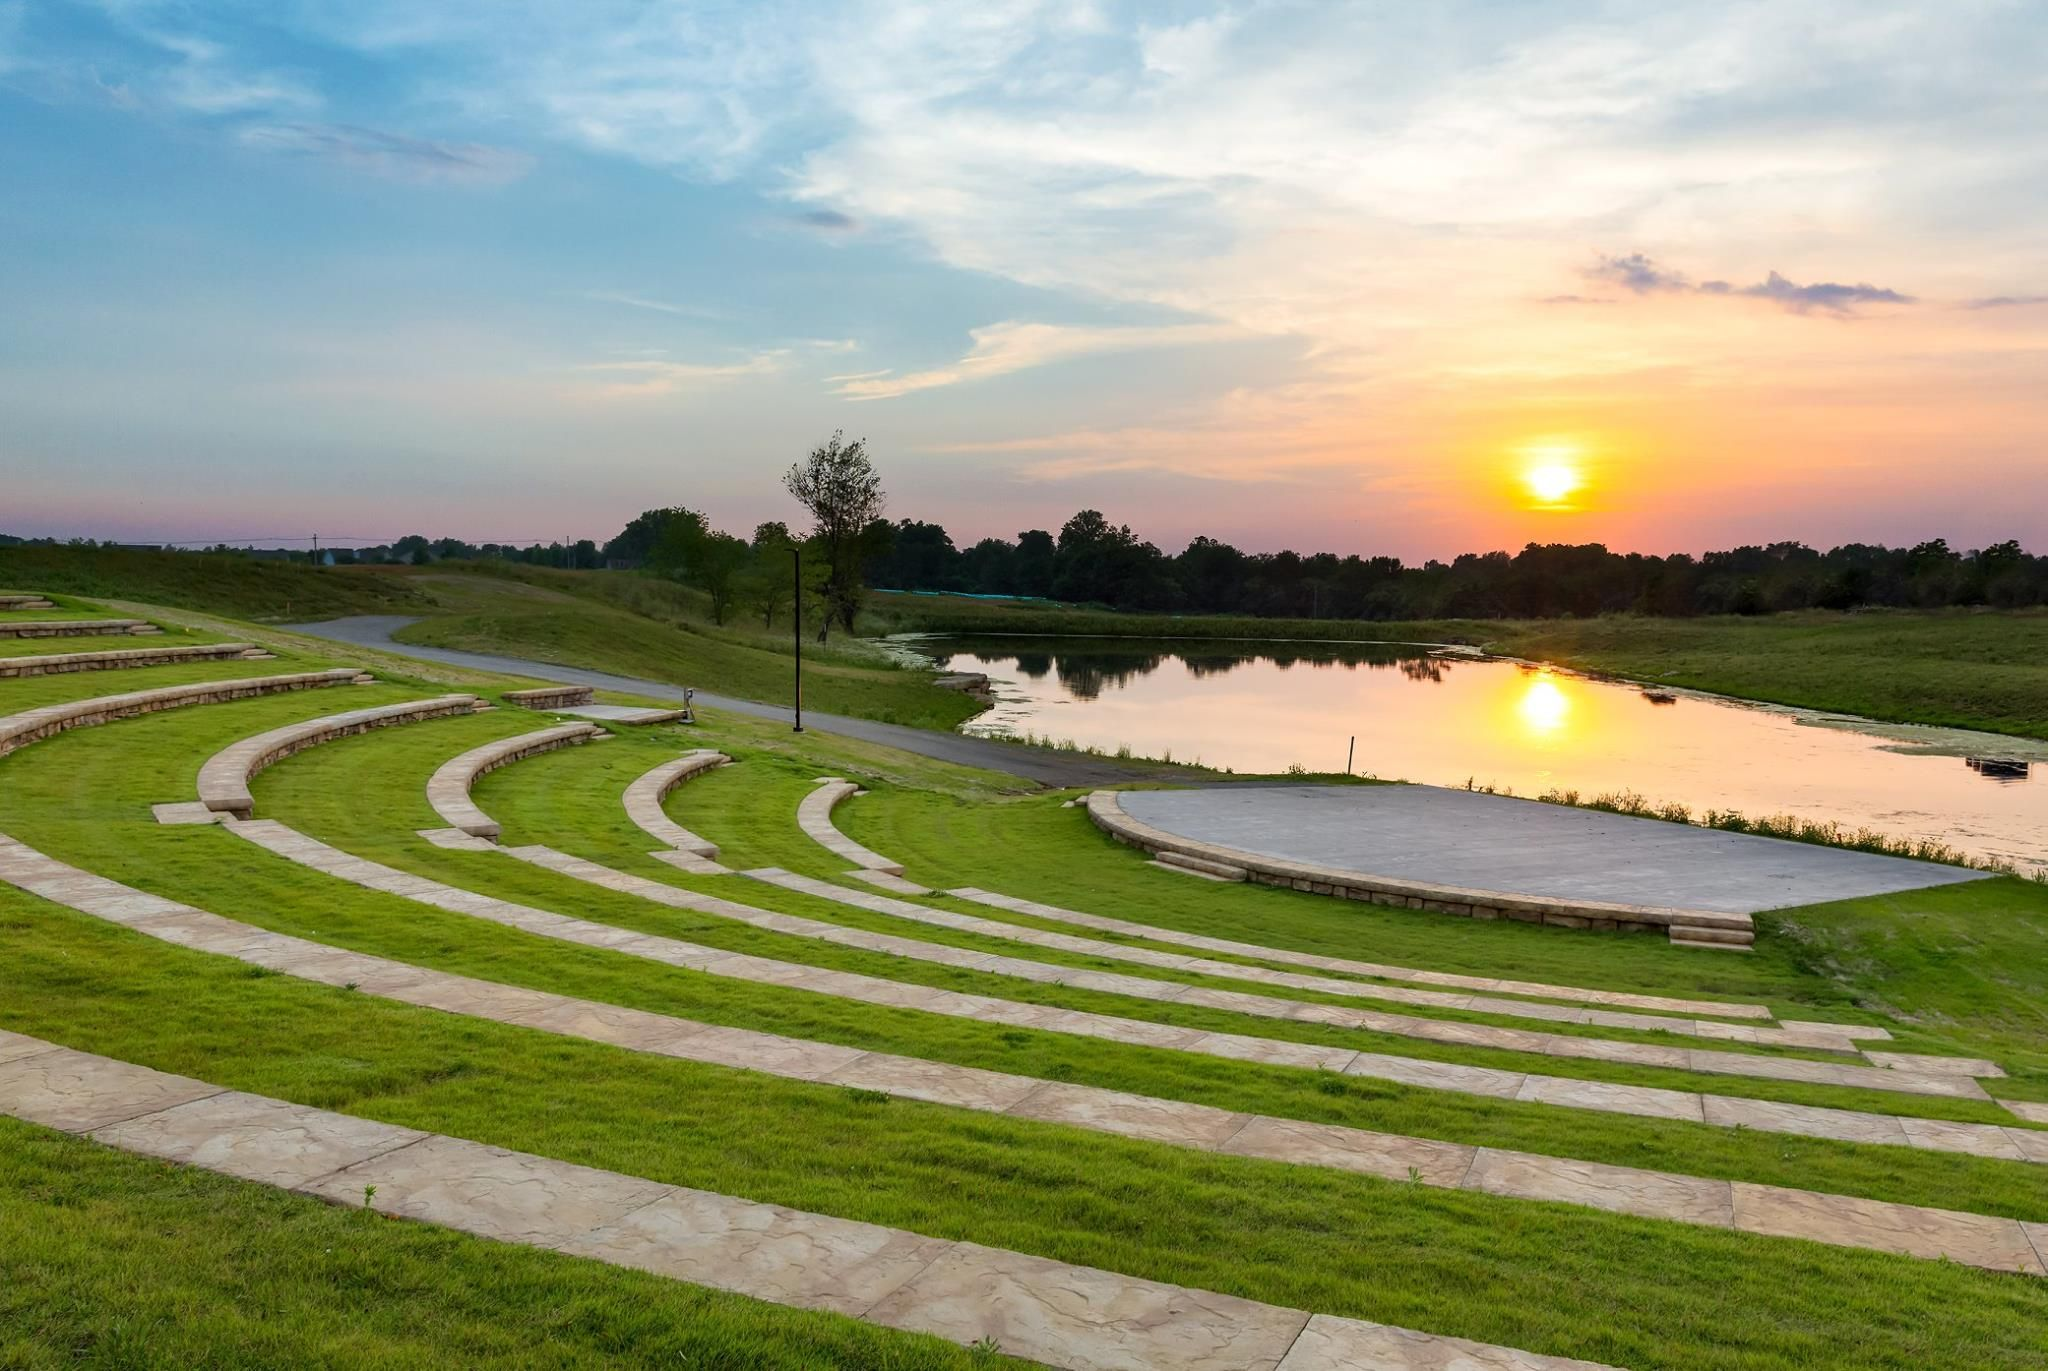 Amphitheater at sunset. Landscape architecture design